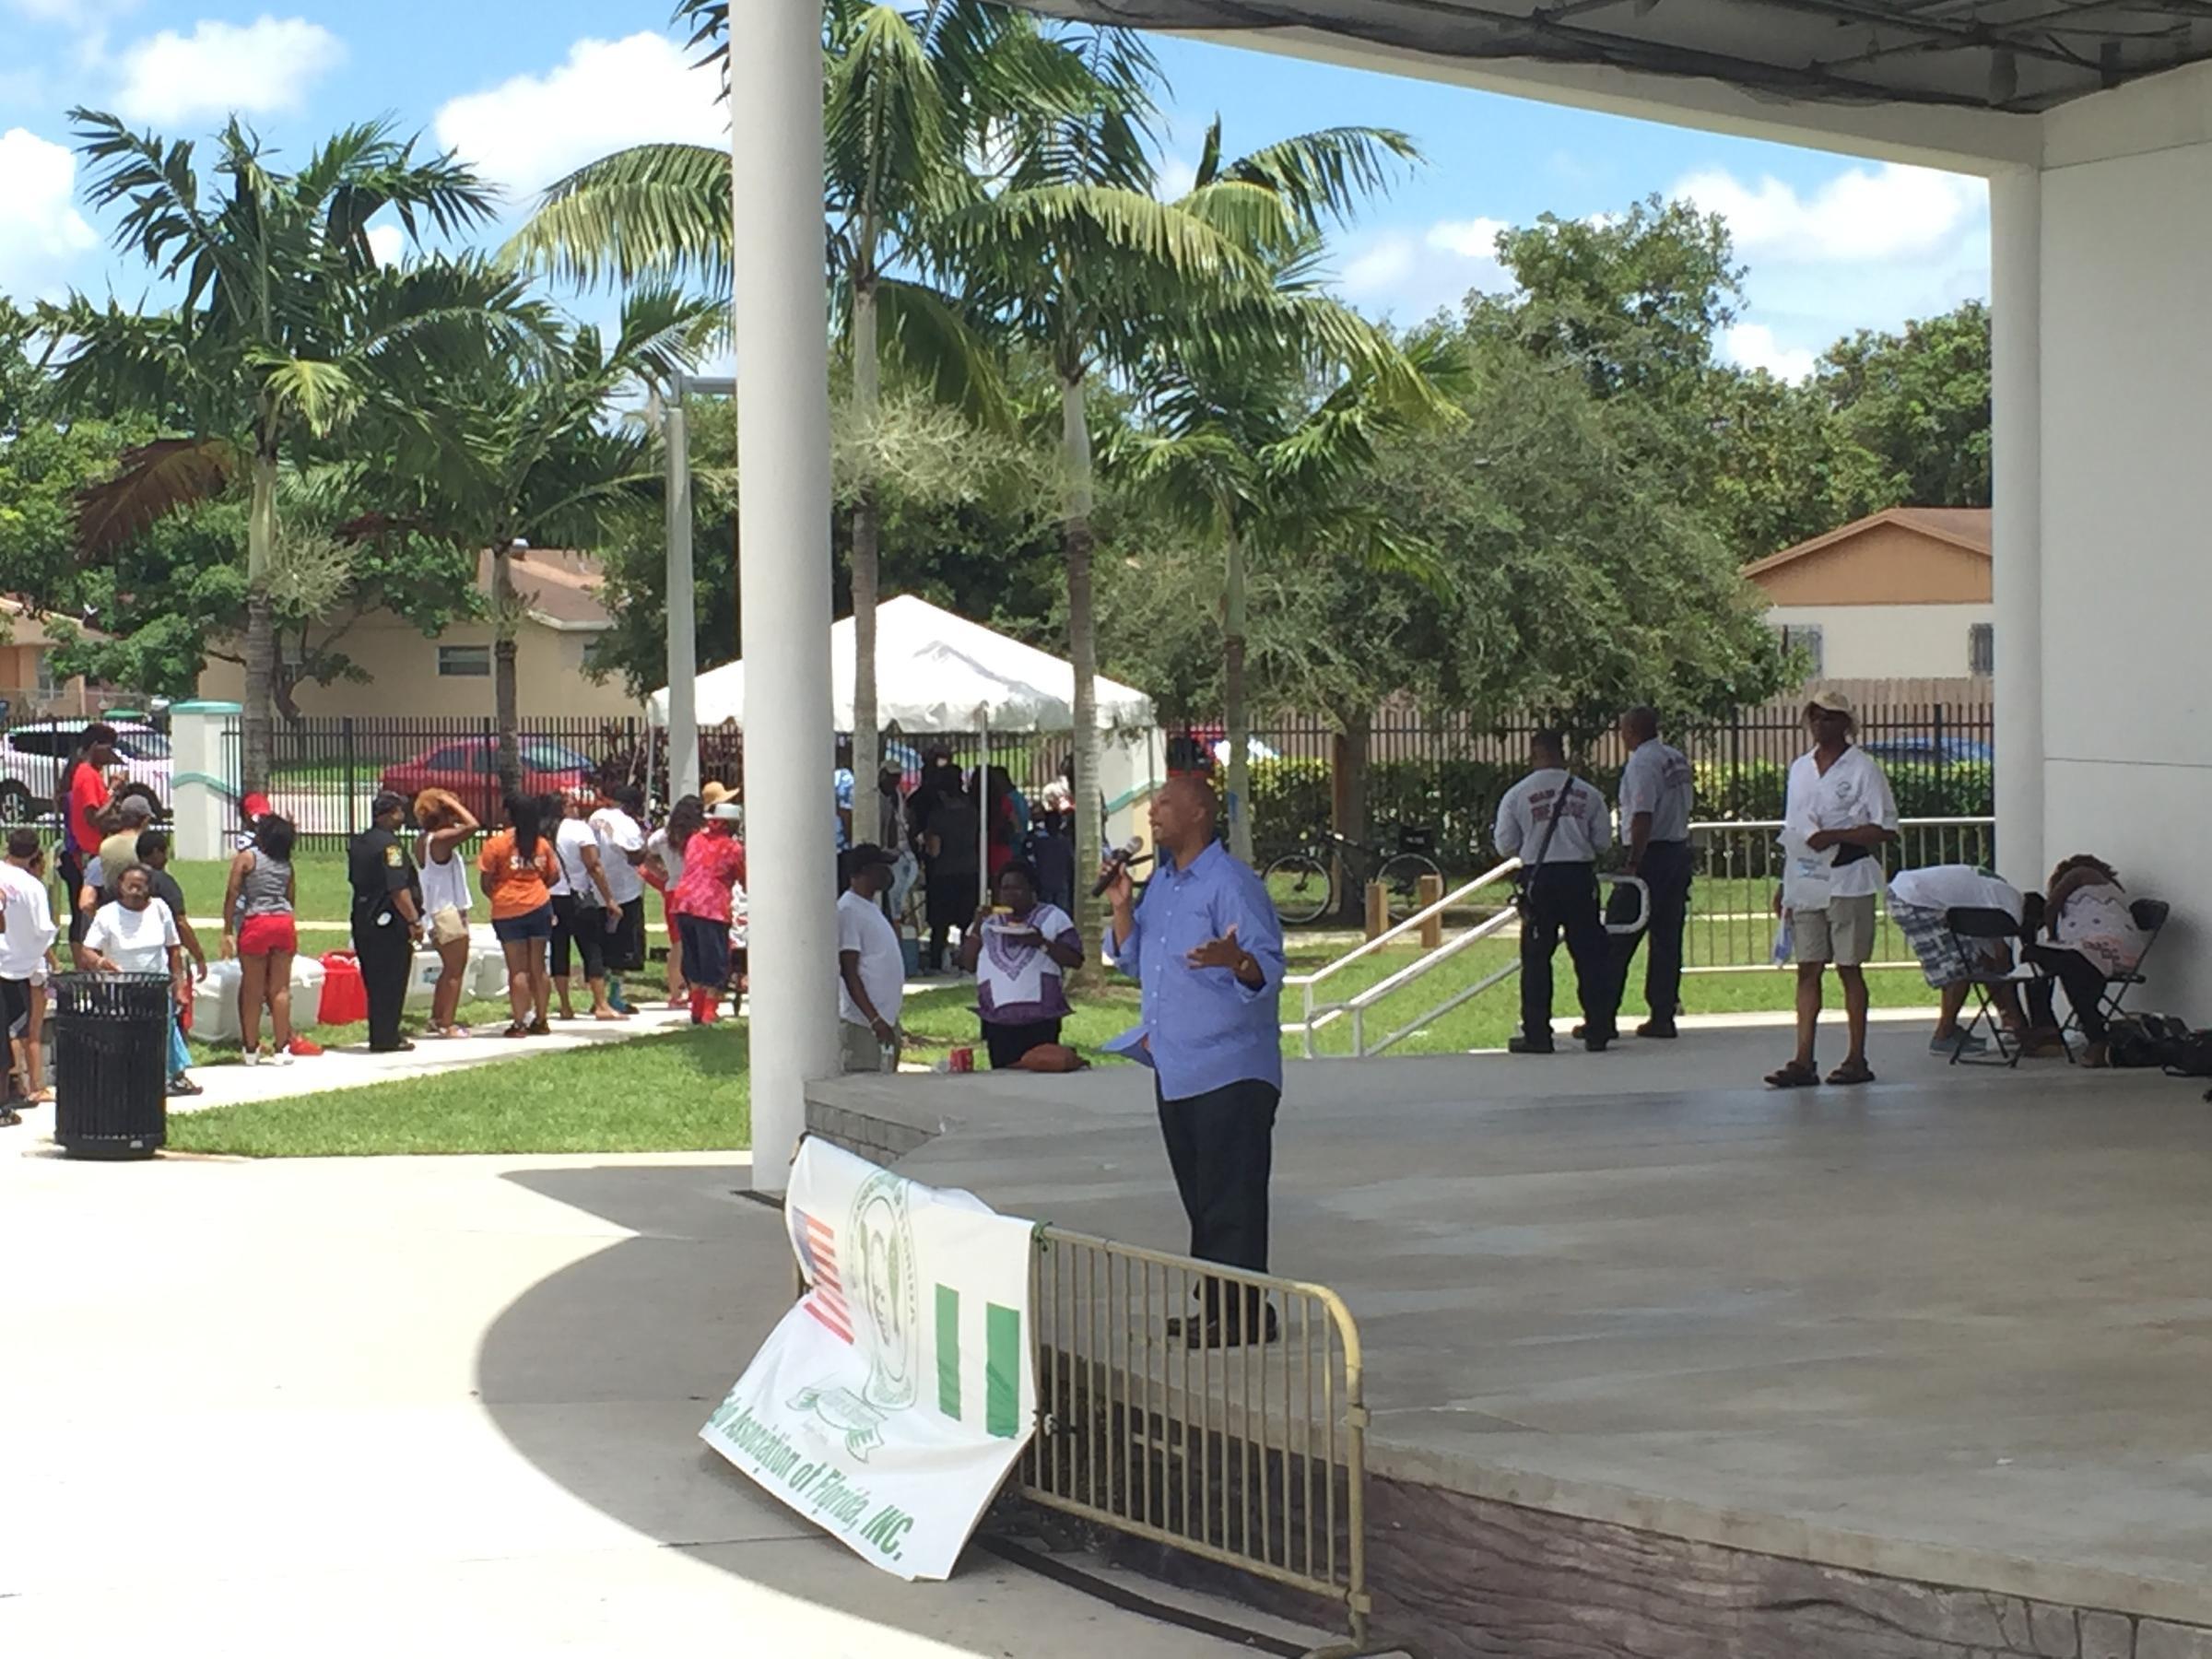 Fourth Of July In Miami Gardens Nigerian Style Wlrn